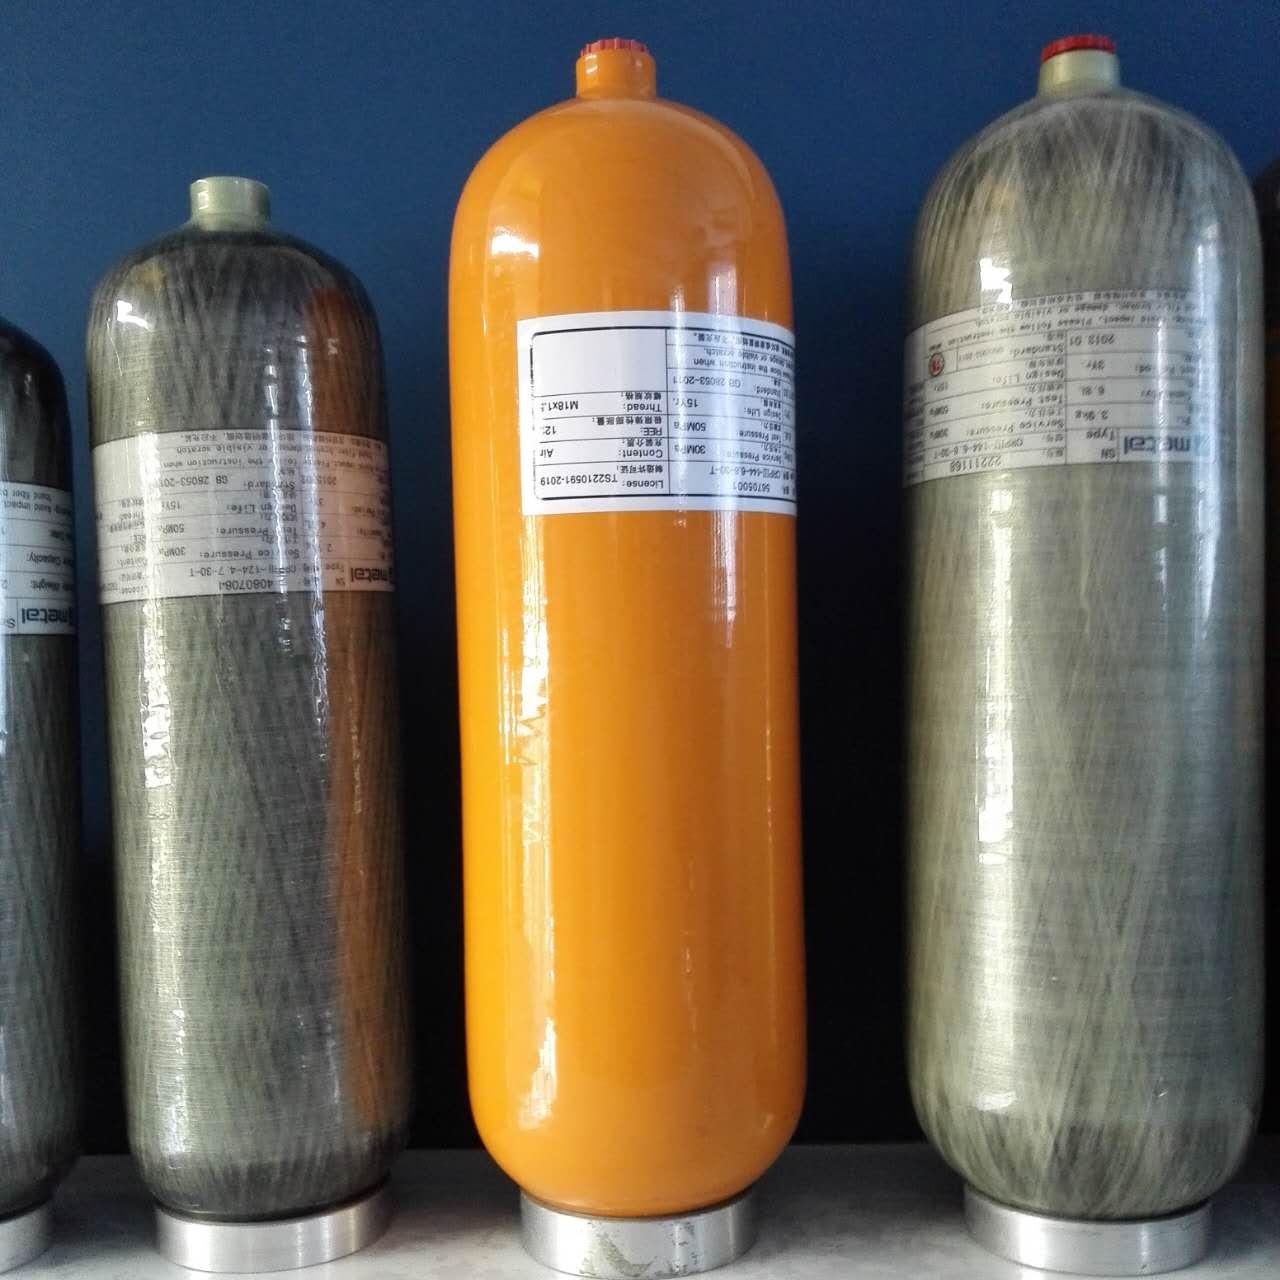 CRPIII144-6.8-30T Life Support Cylinder